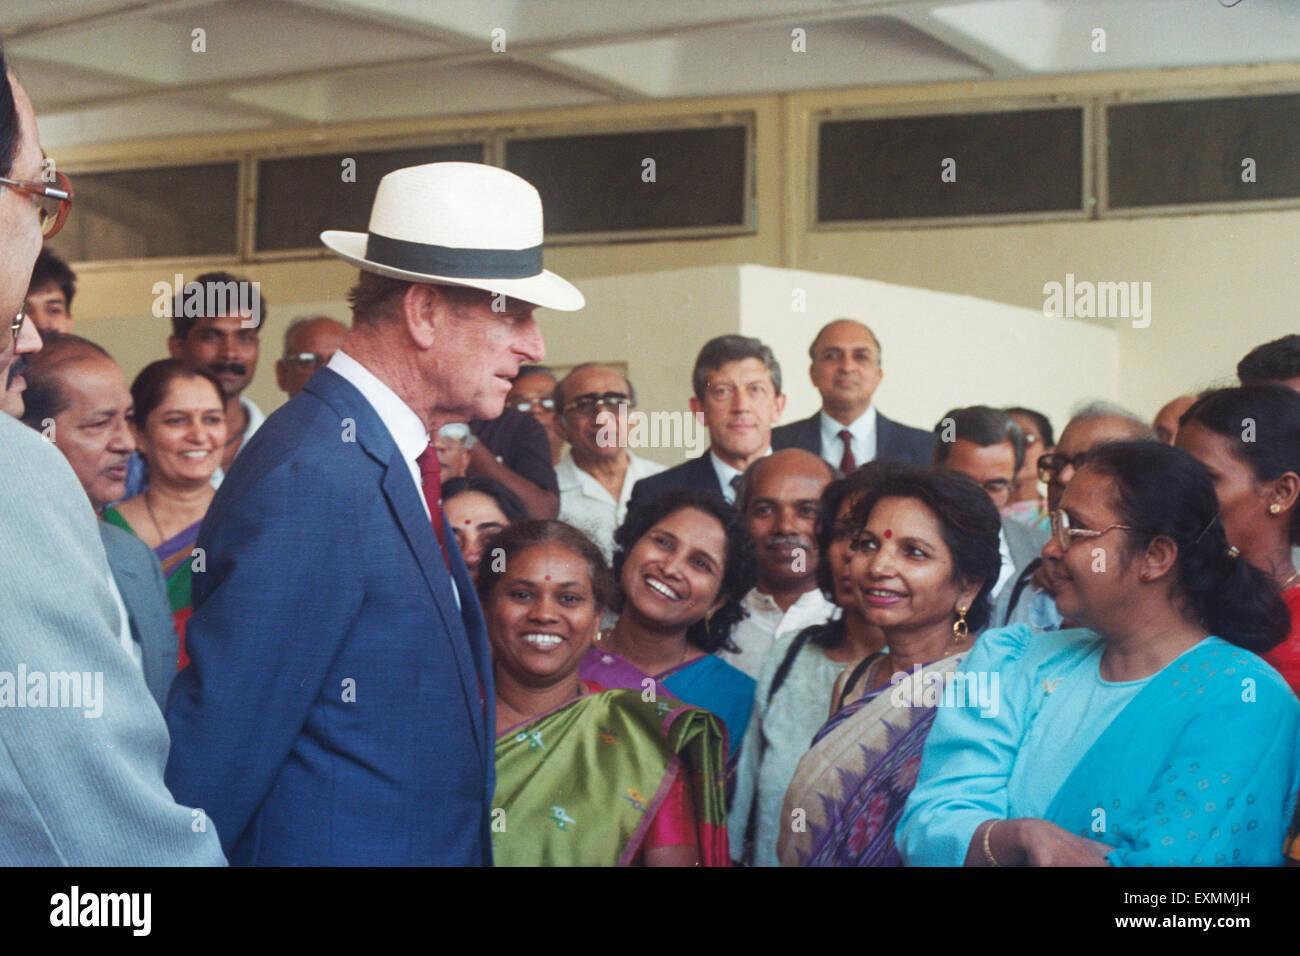 Prince Philip talking to Indian women, Mumbai India Stock Photo